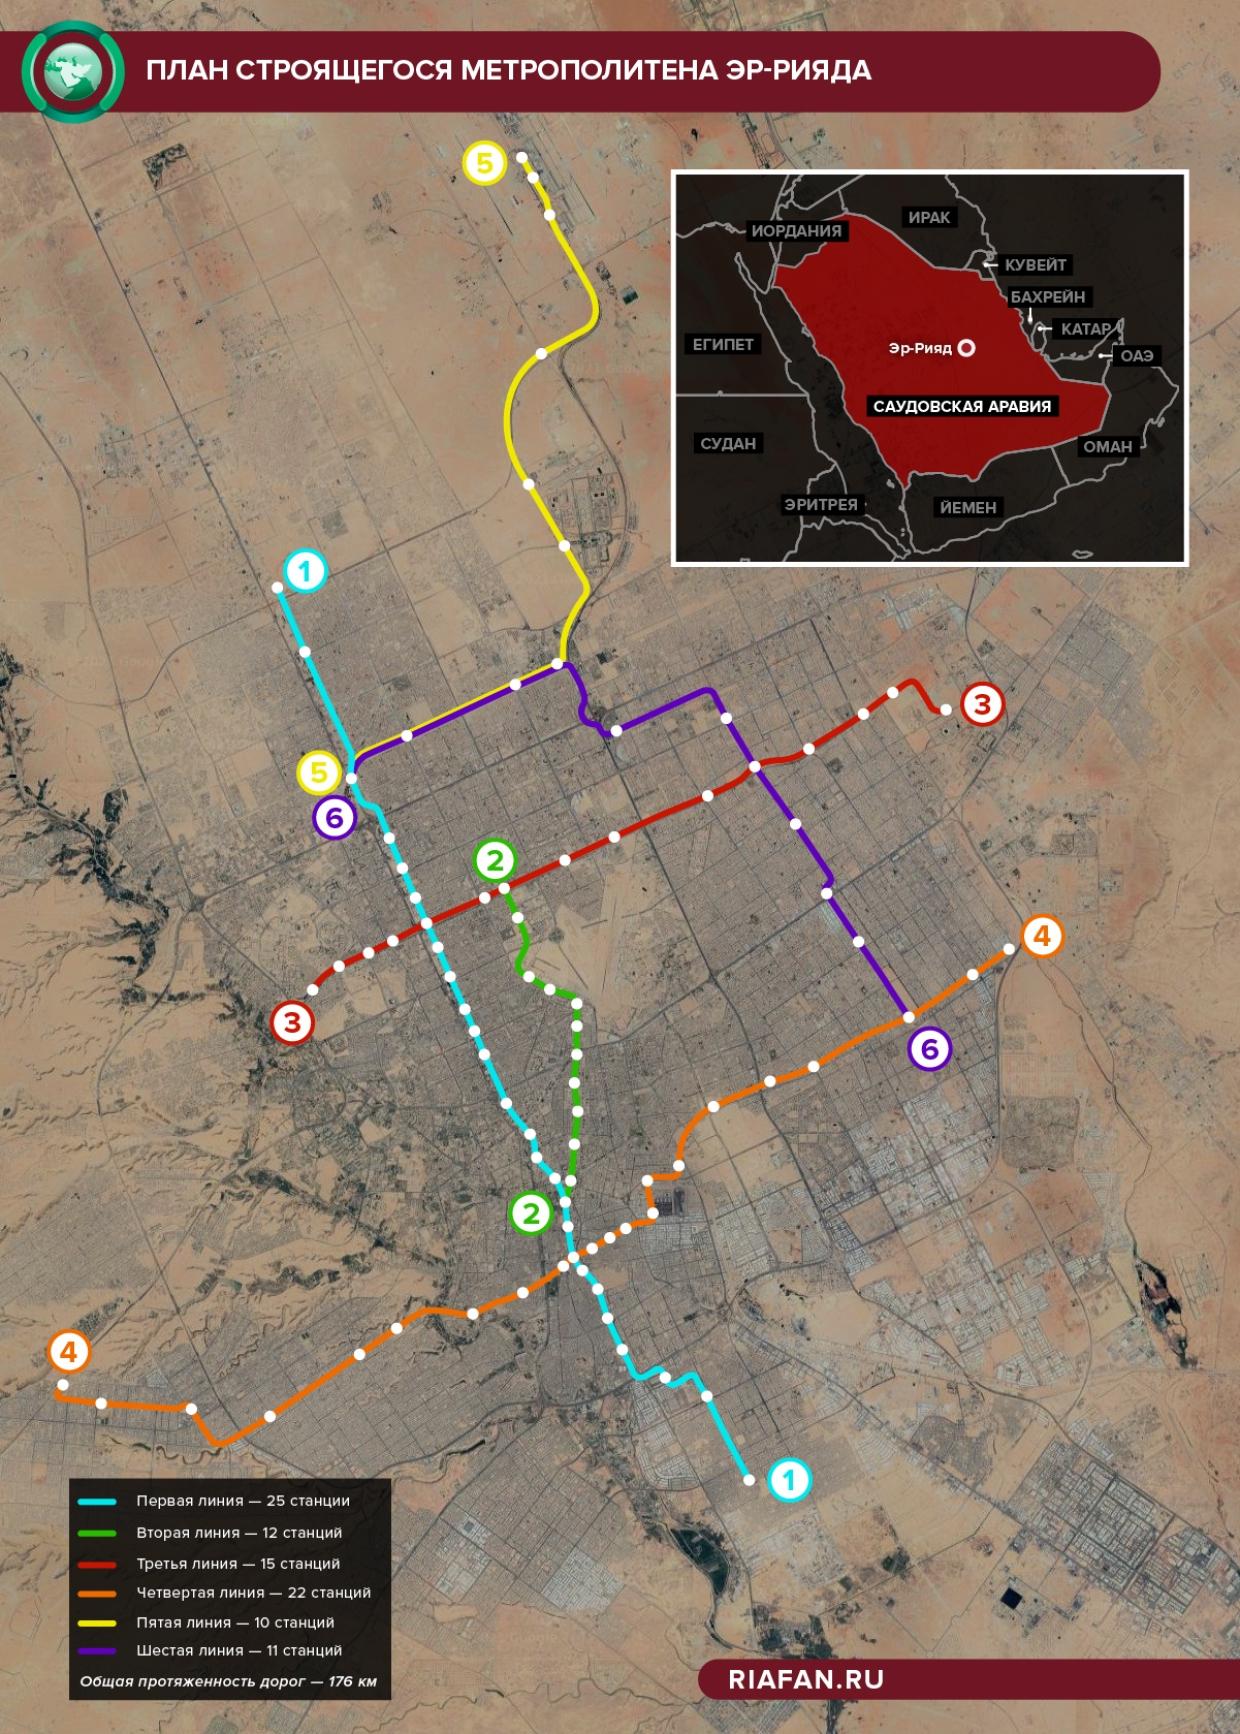 План строящегося метрополитена Эр-Рияда